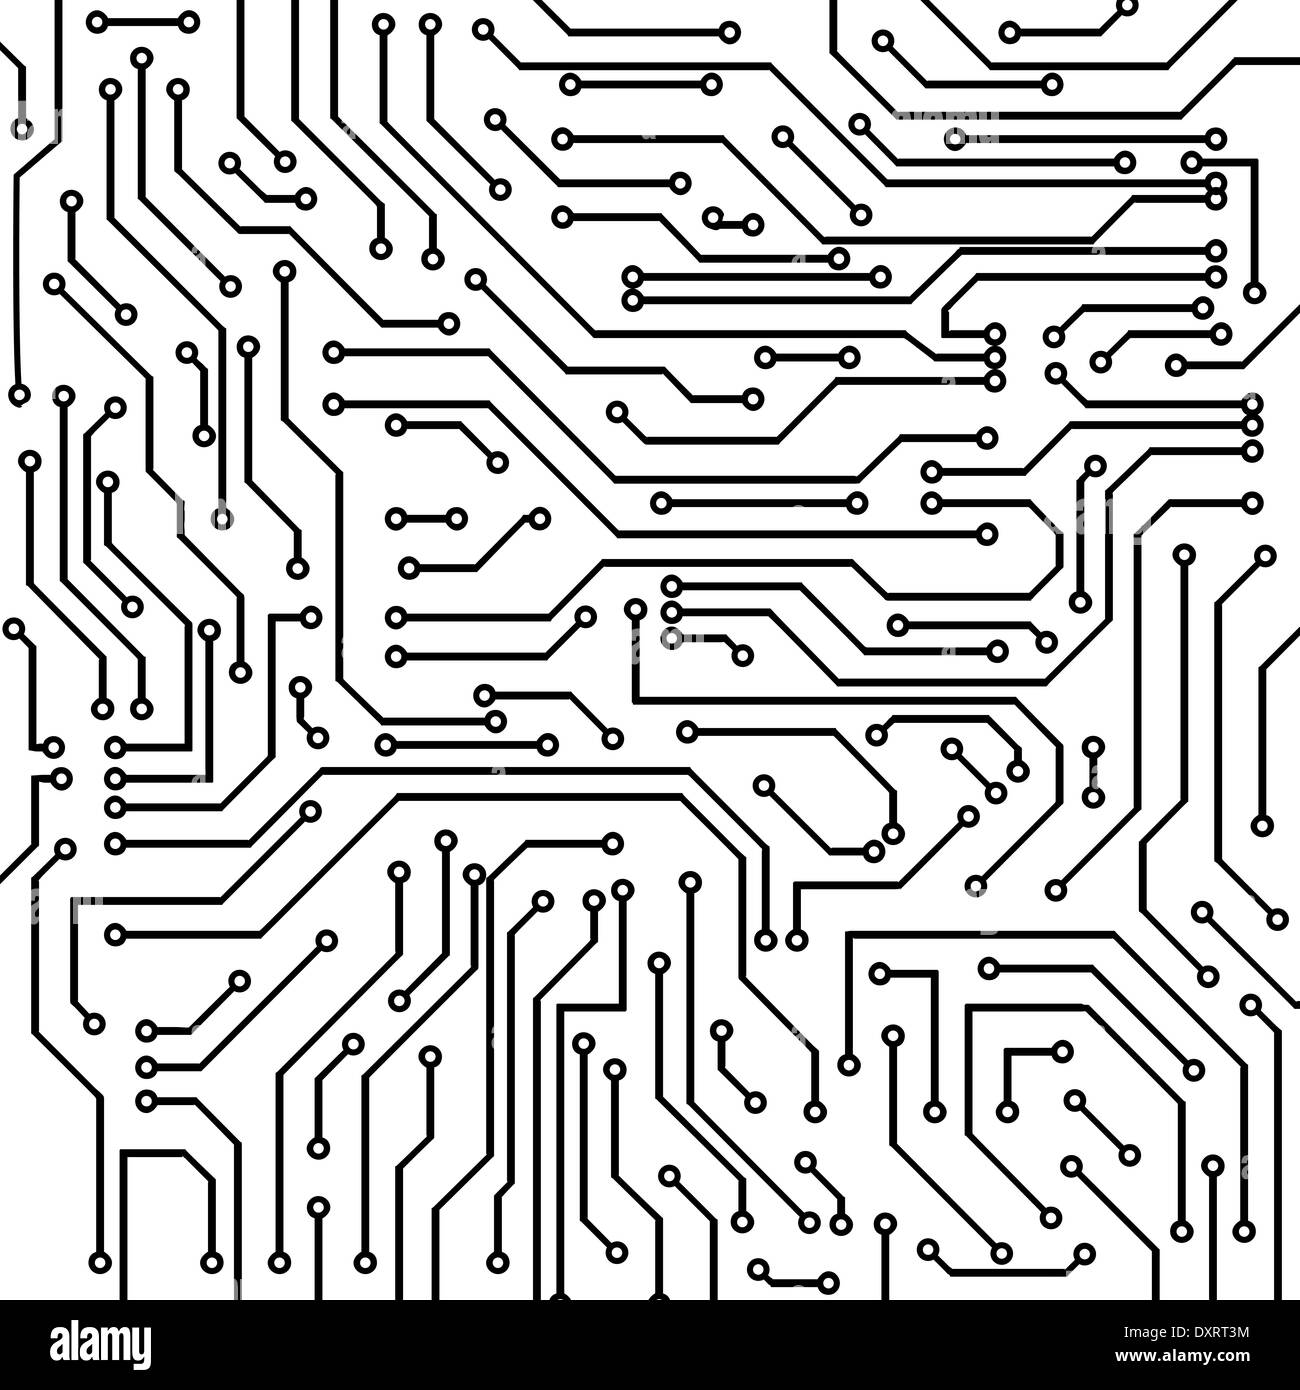 Circuit board vector background Stock Photo: 68135976 - Alamy